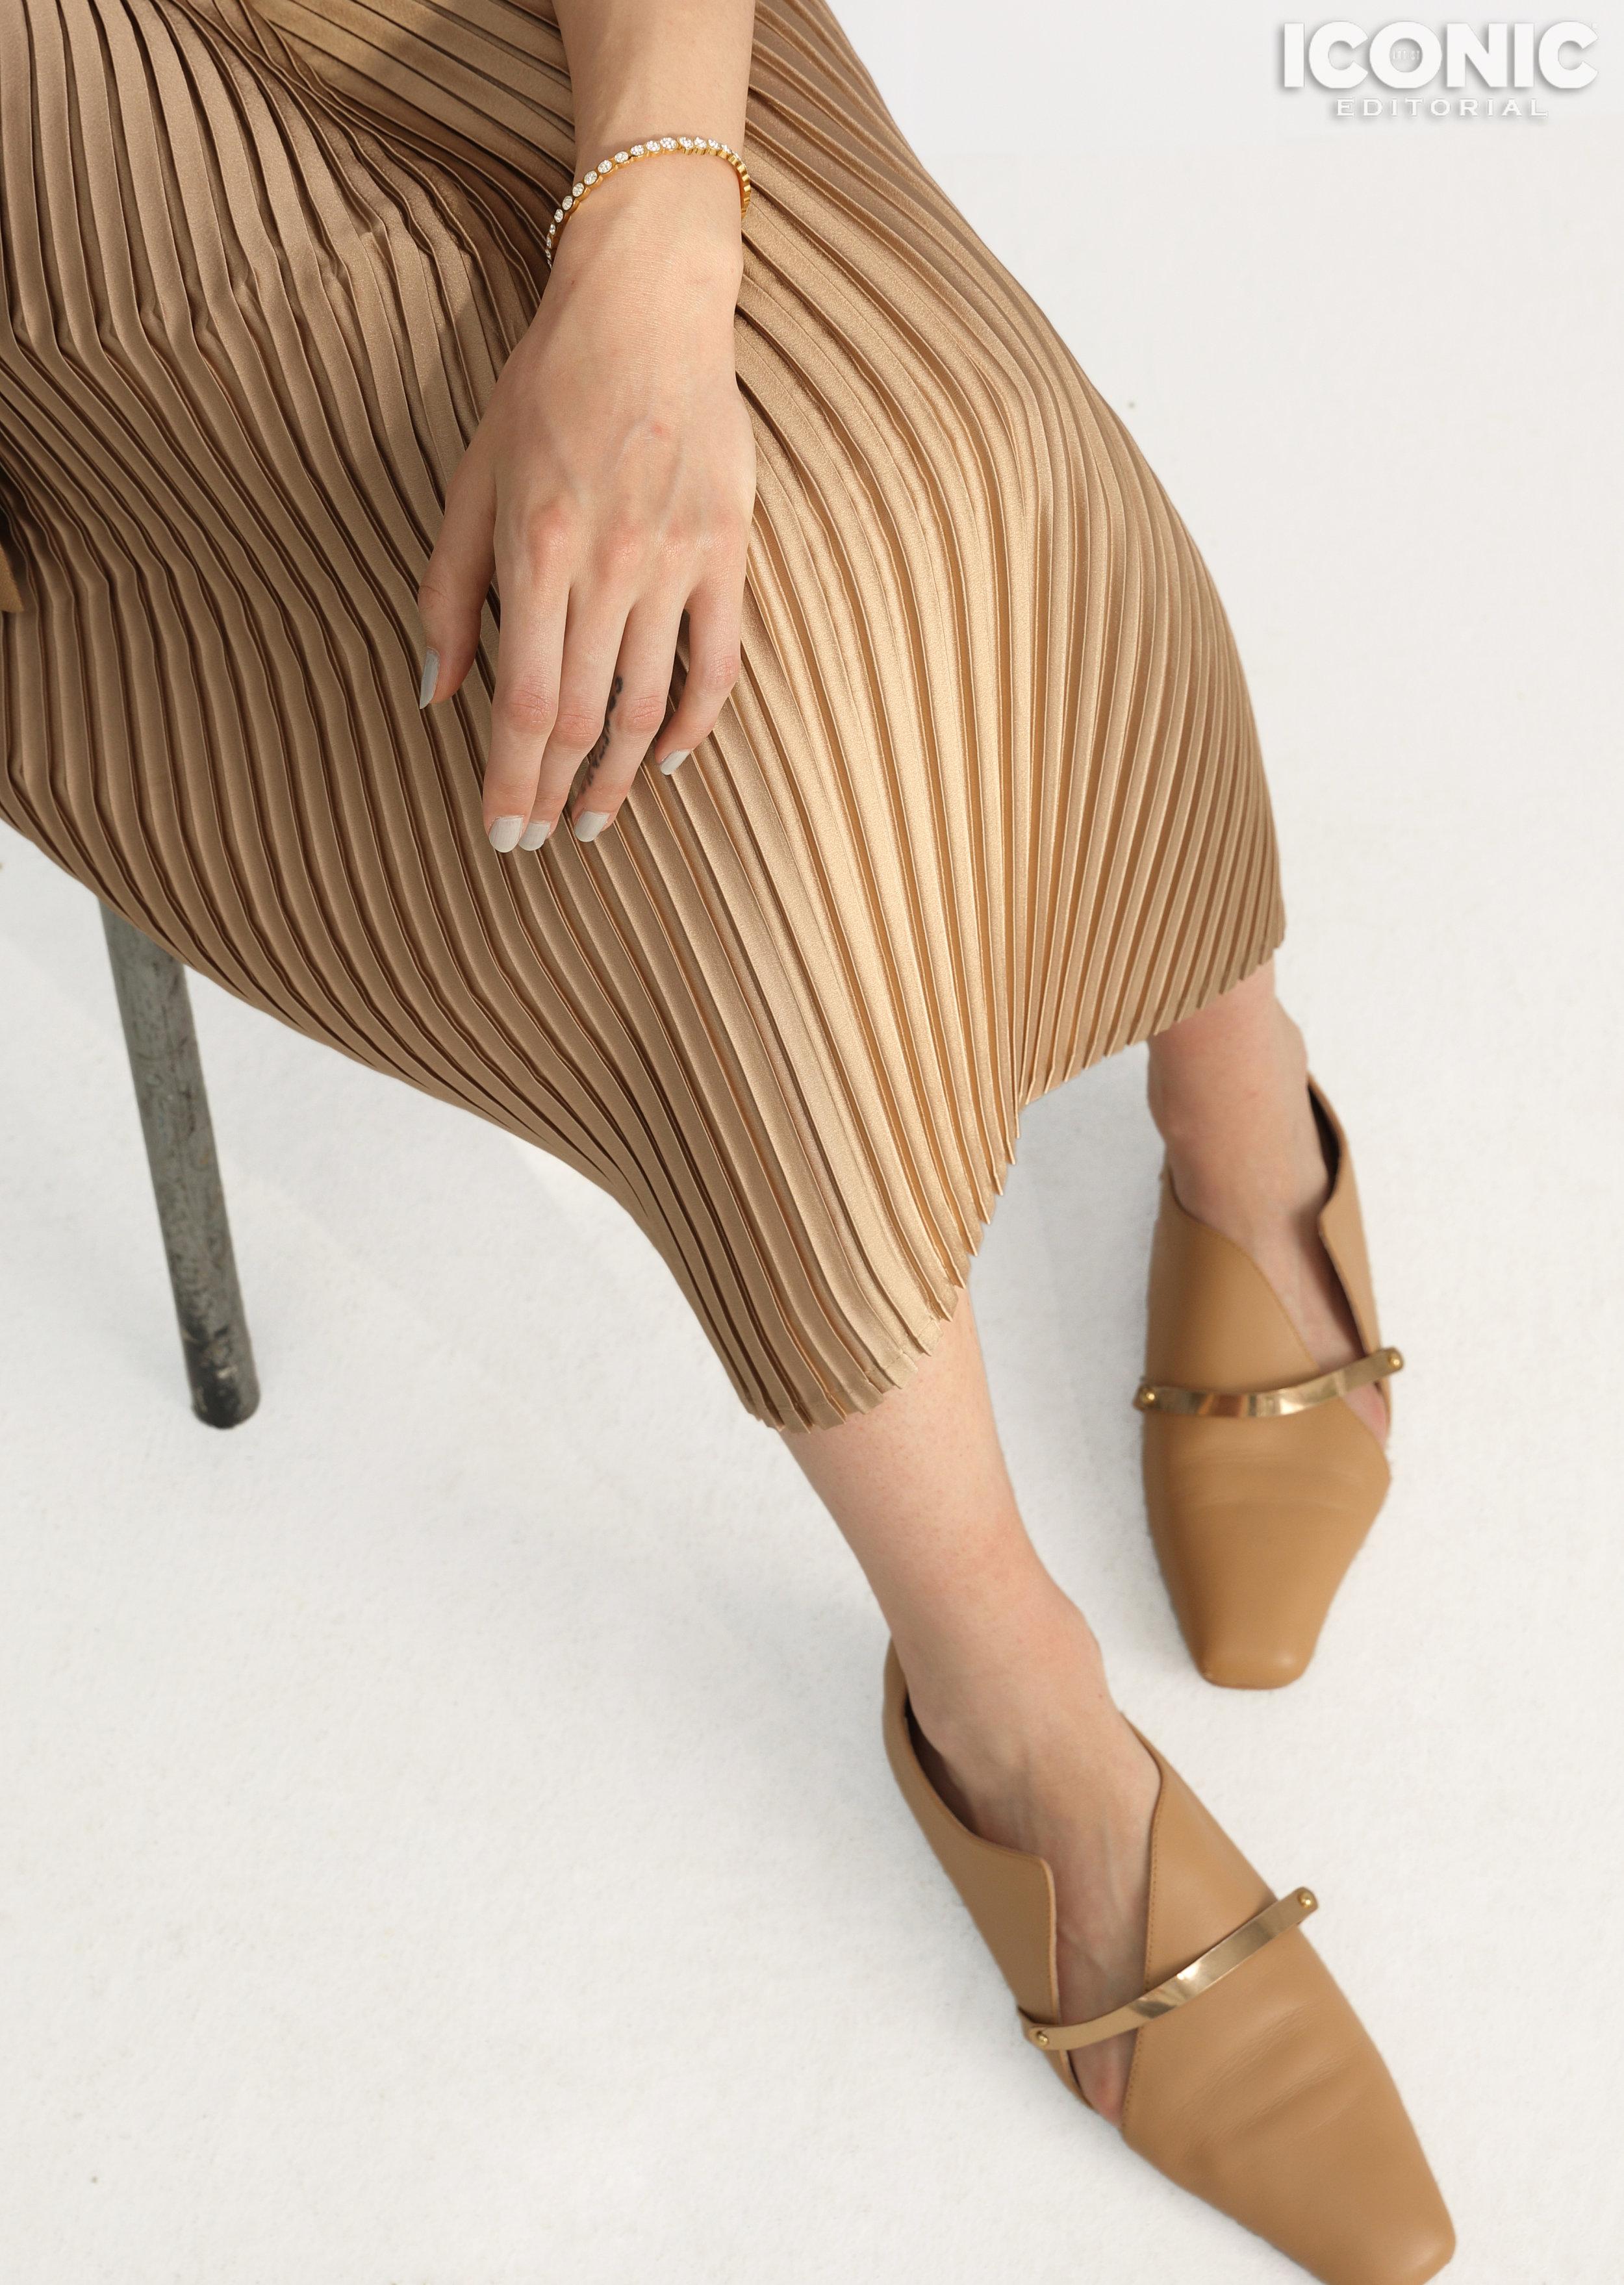 7/8  Dress & Shoes |  @lanneret.ins   © Leesin